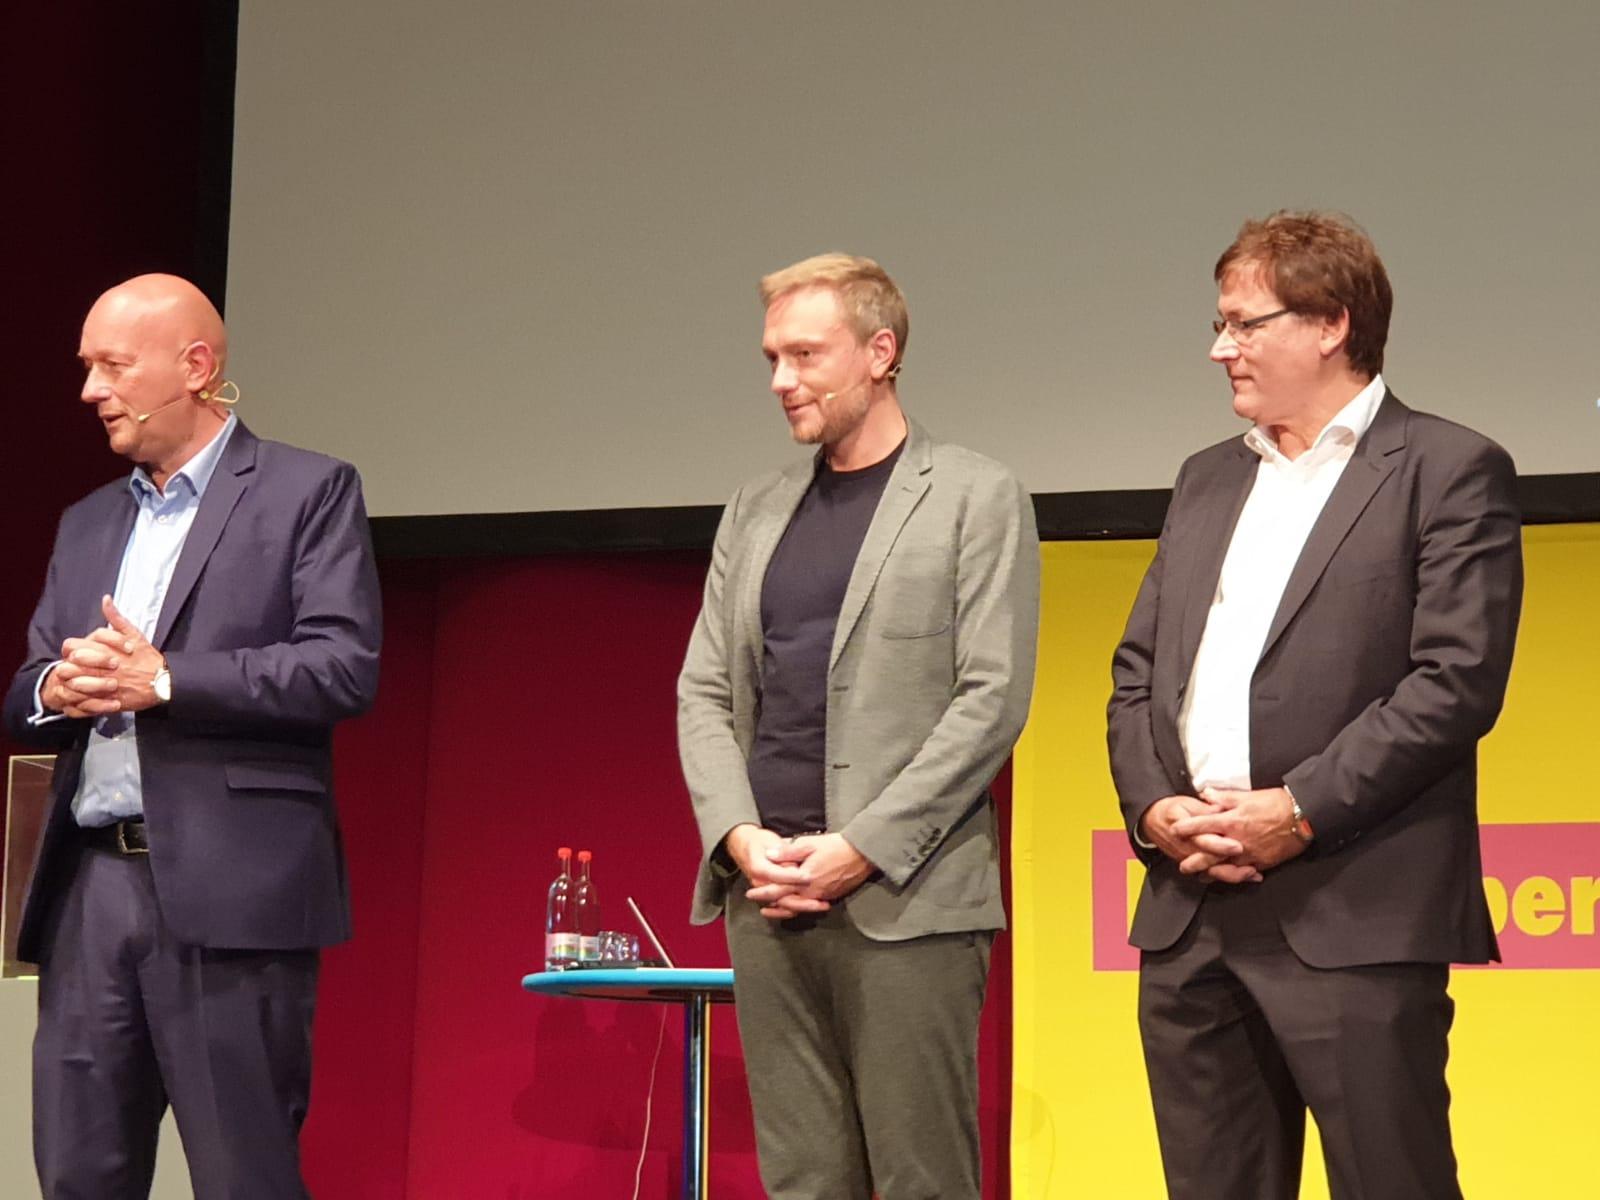 Thomas L. Kemmerich, Christian Lindner und Gerald Ullrich